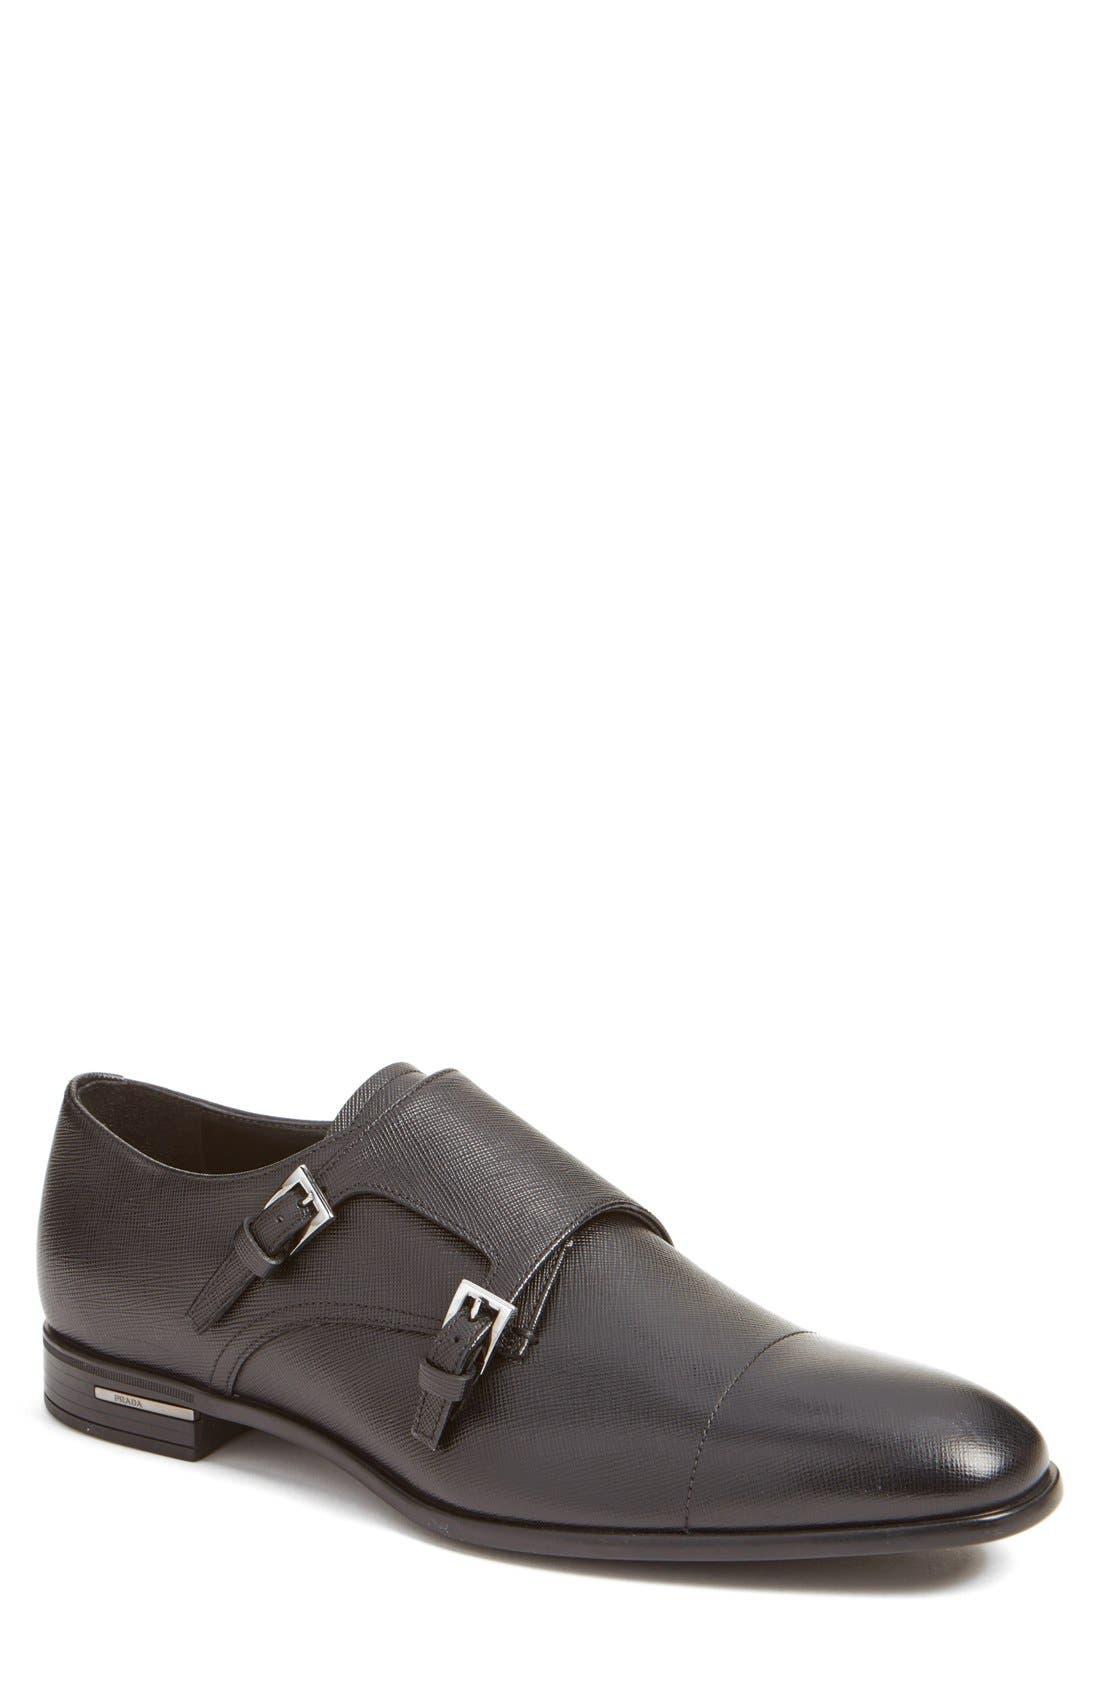 PRADA Double Monk Strap Shoe, Main, color, NERO LEATHER